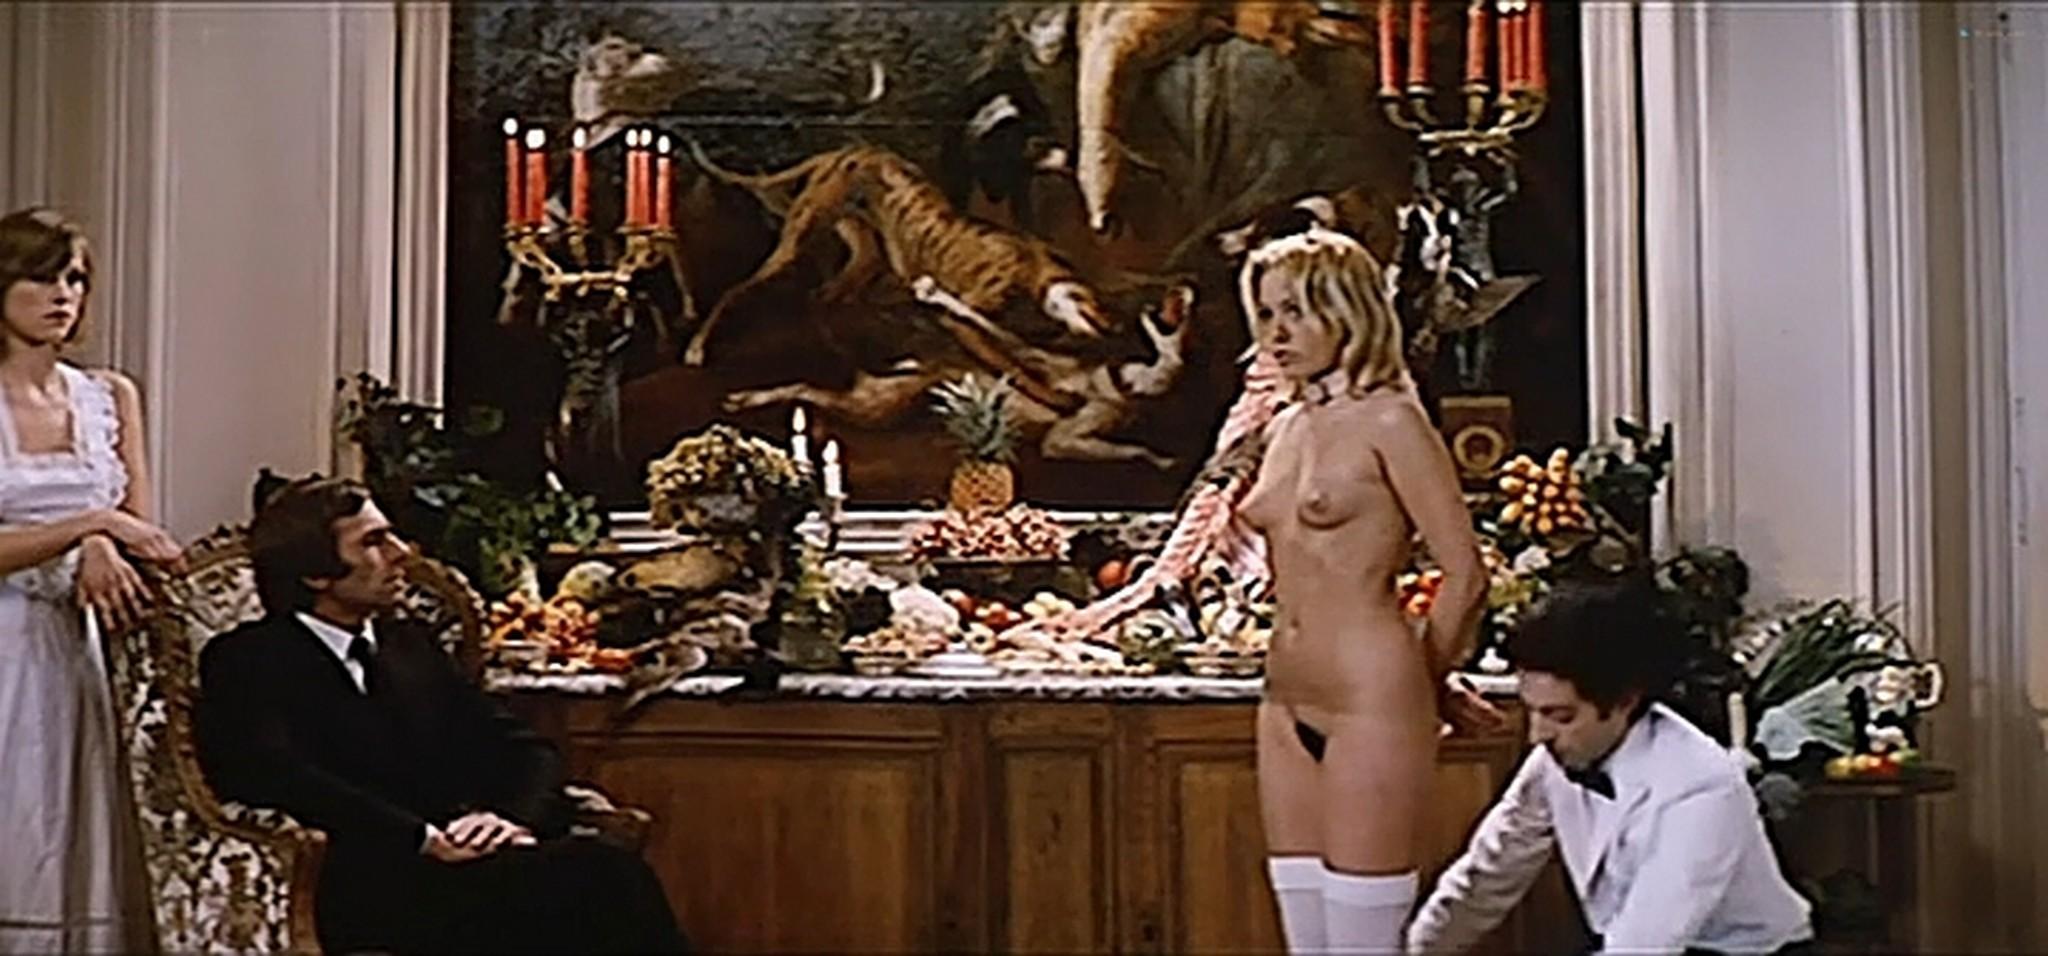 Anicee Alvina nude full frontal Sylvia Kristel and others nude Le jeu avec le feu FR 1975 DVDrip 7